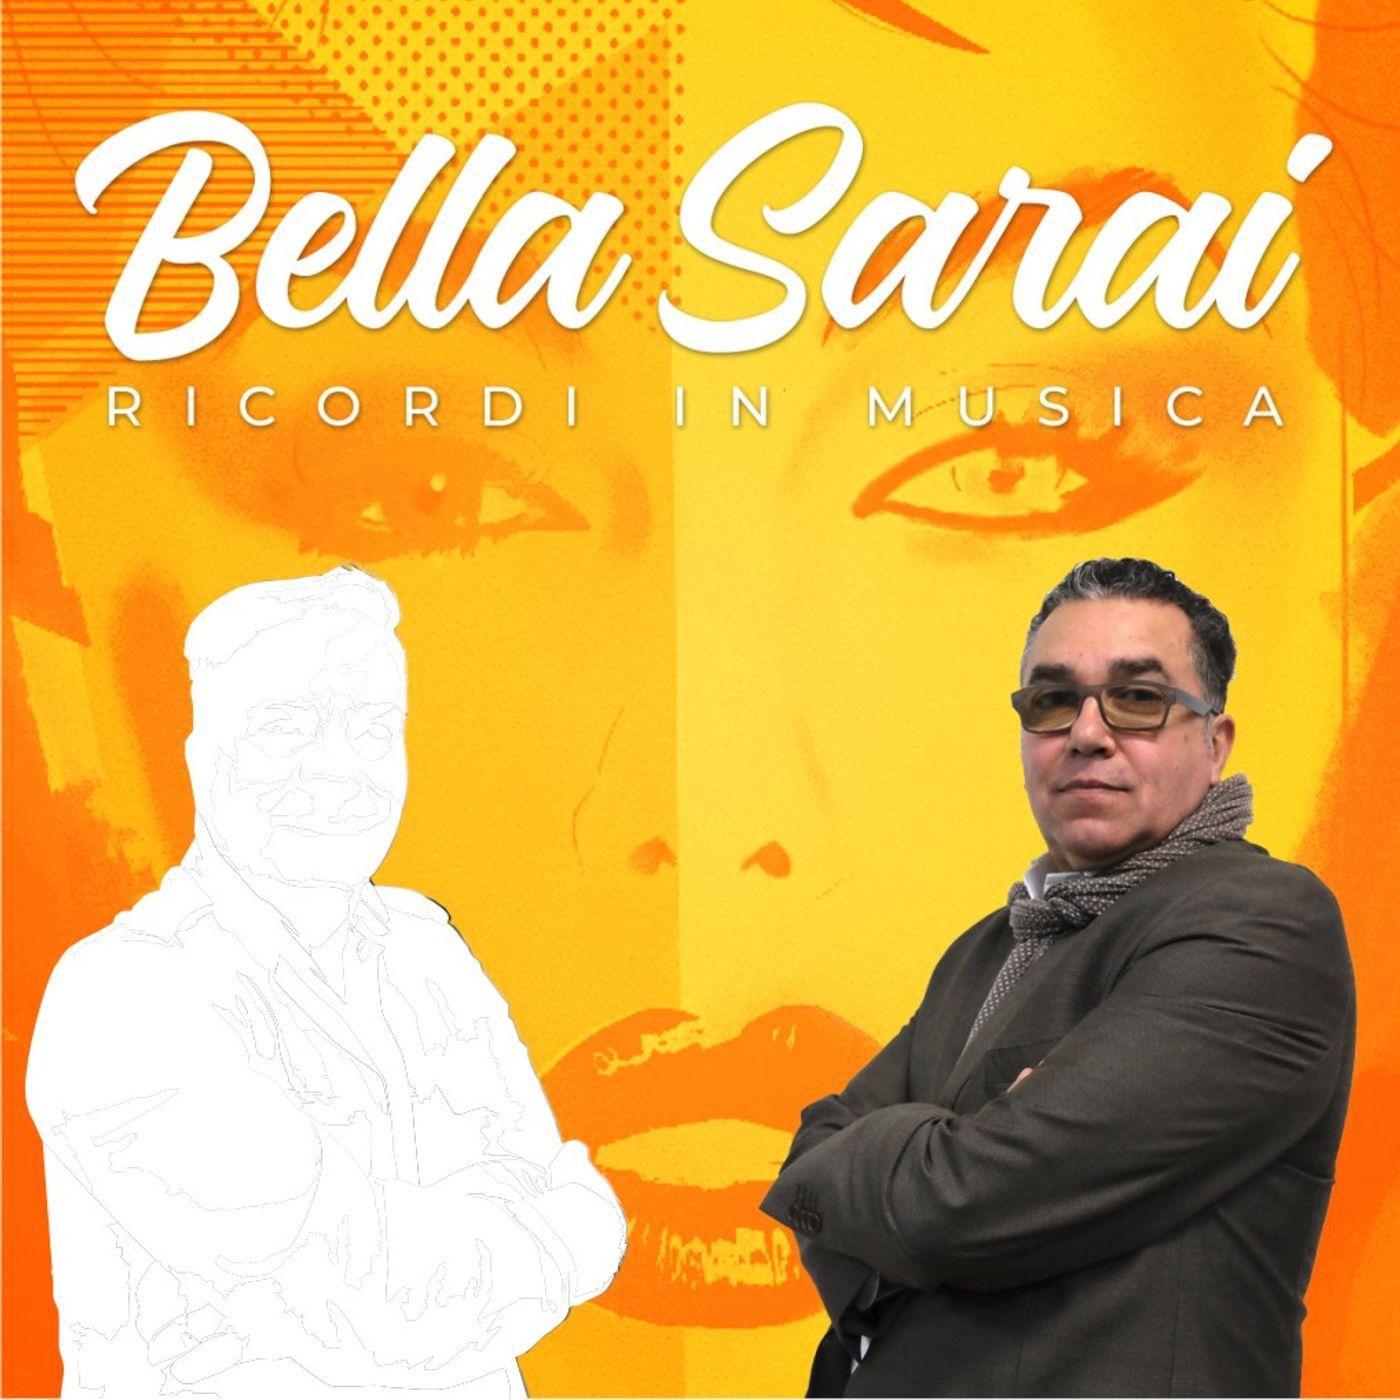 Bella Sarai....